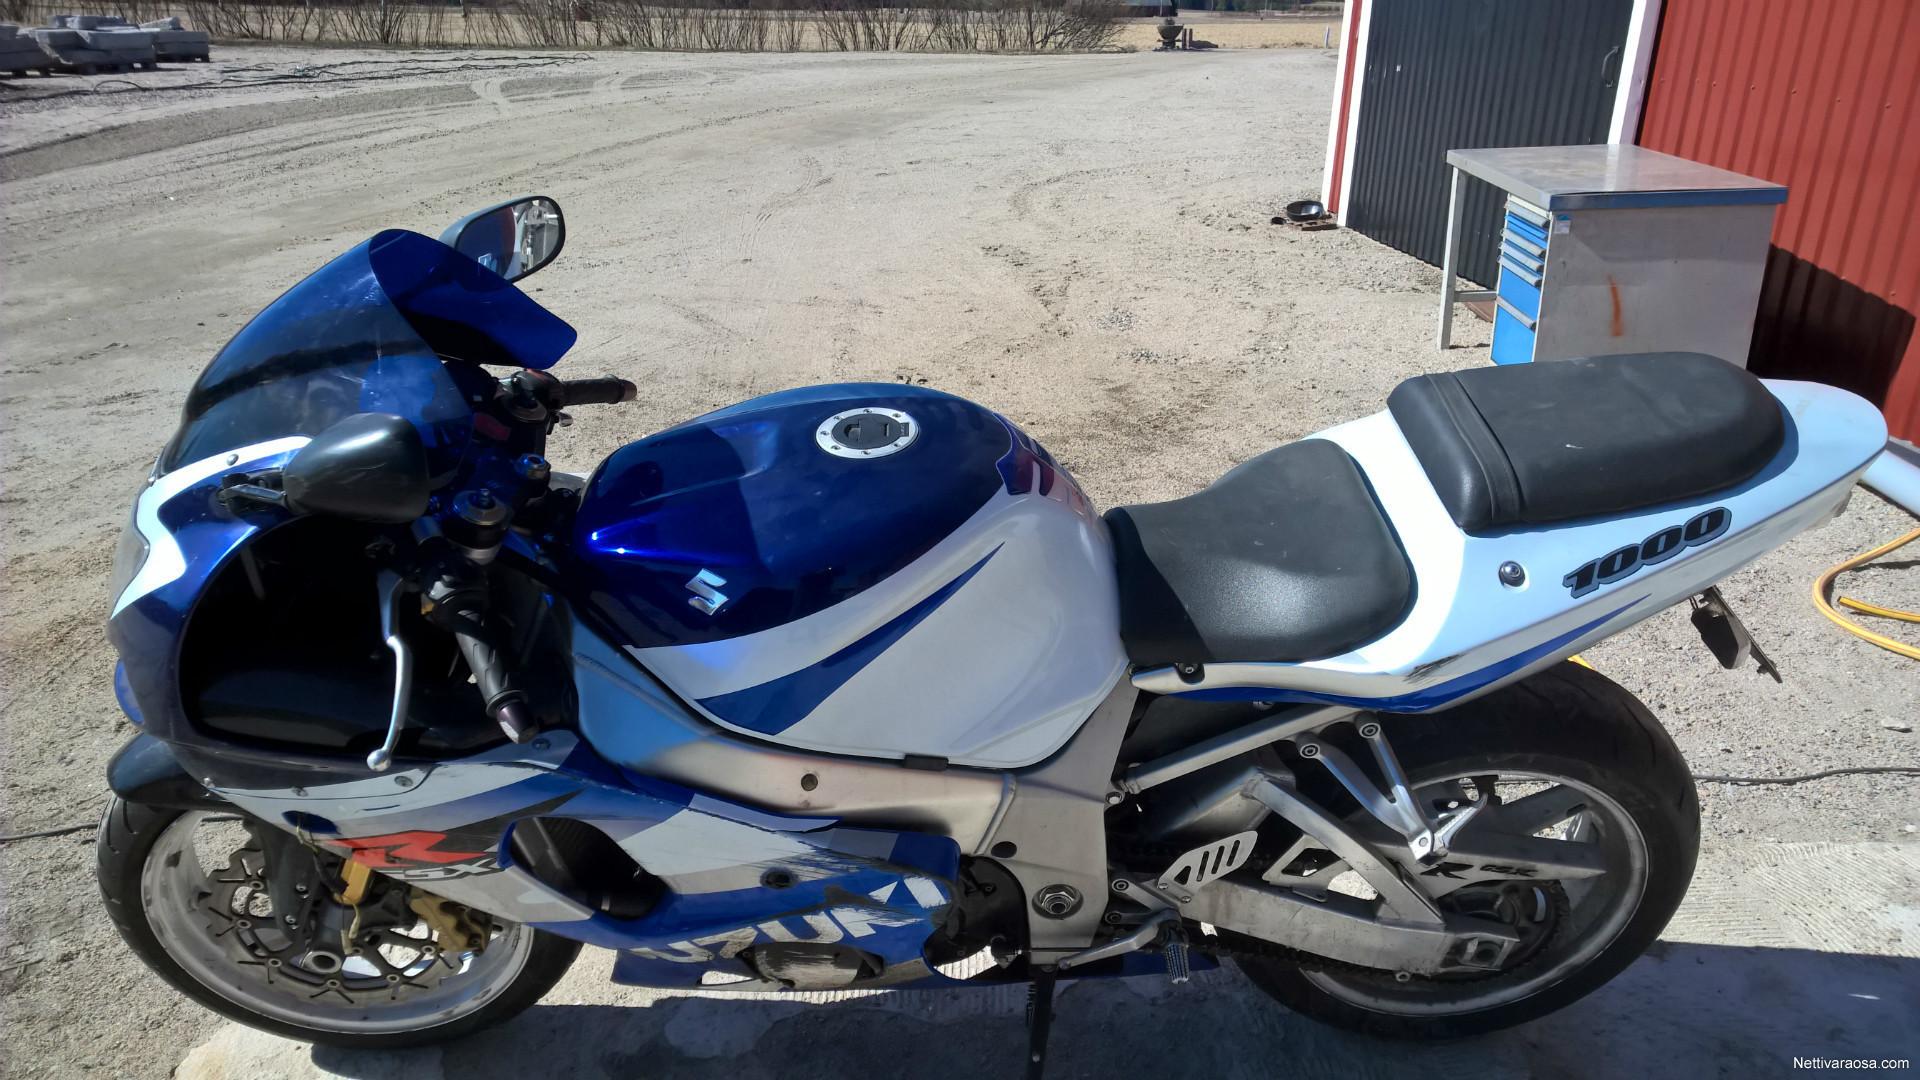 Suzuki Gsxr1000 2002 Motorcycle Spare Parts And Accessories Nettivaraosa